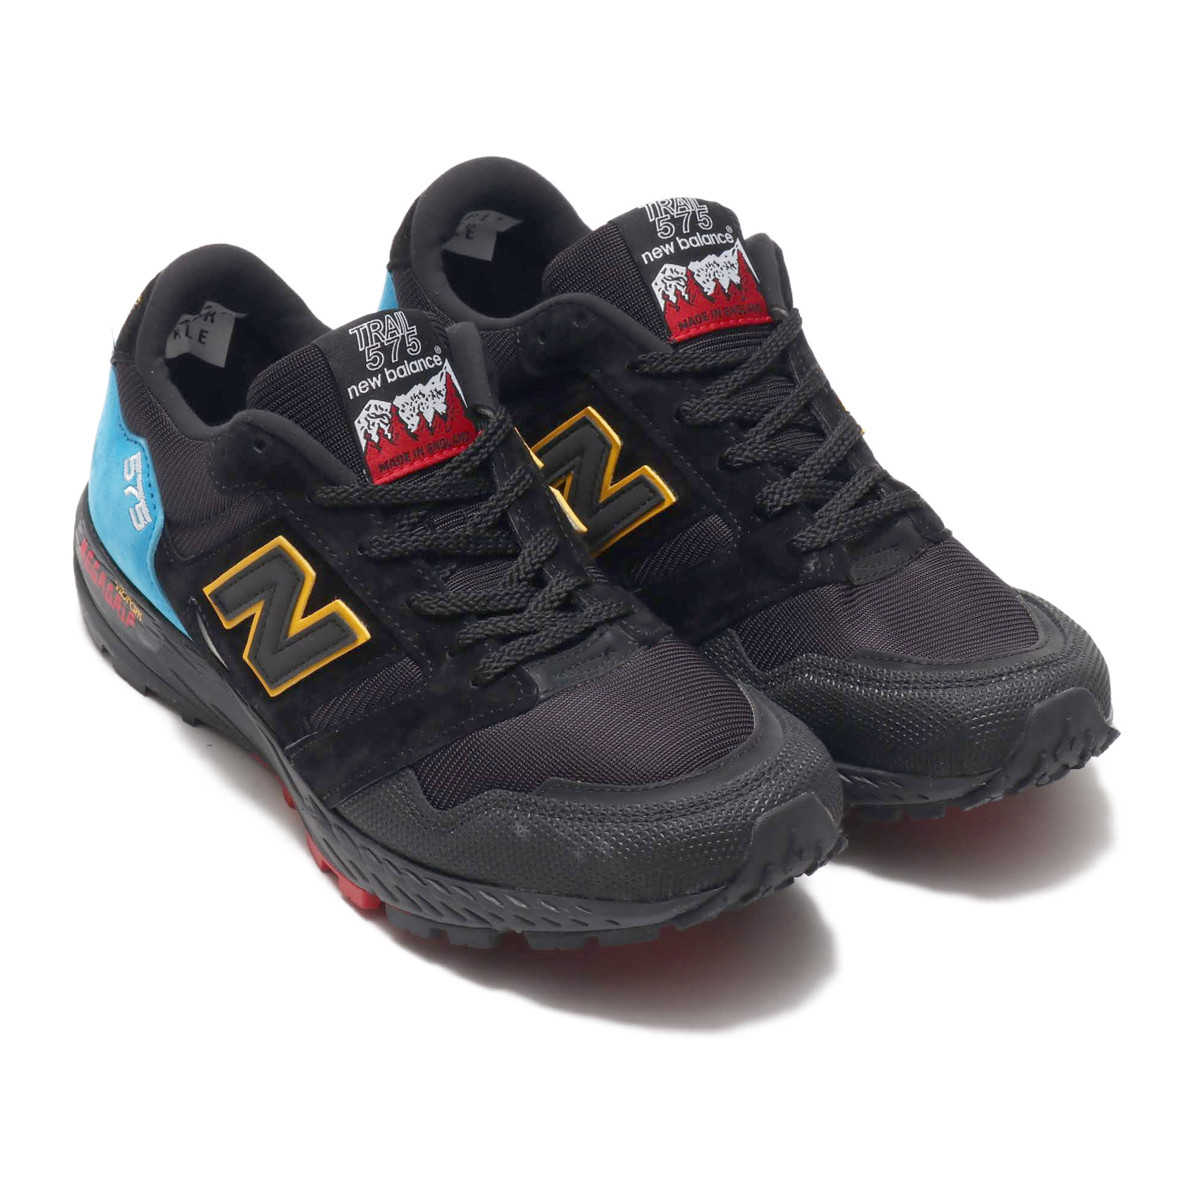 New Balance MTL575UT(ニューバランス MTL575UT)BLACK/BLUE【メンズ スニーカー】19FW-I